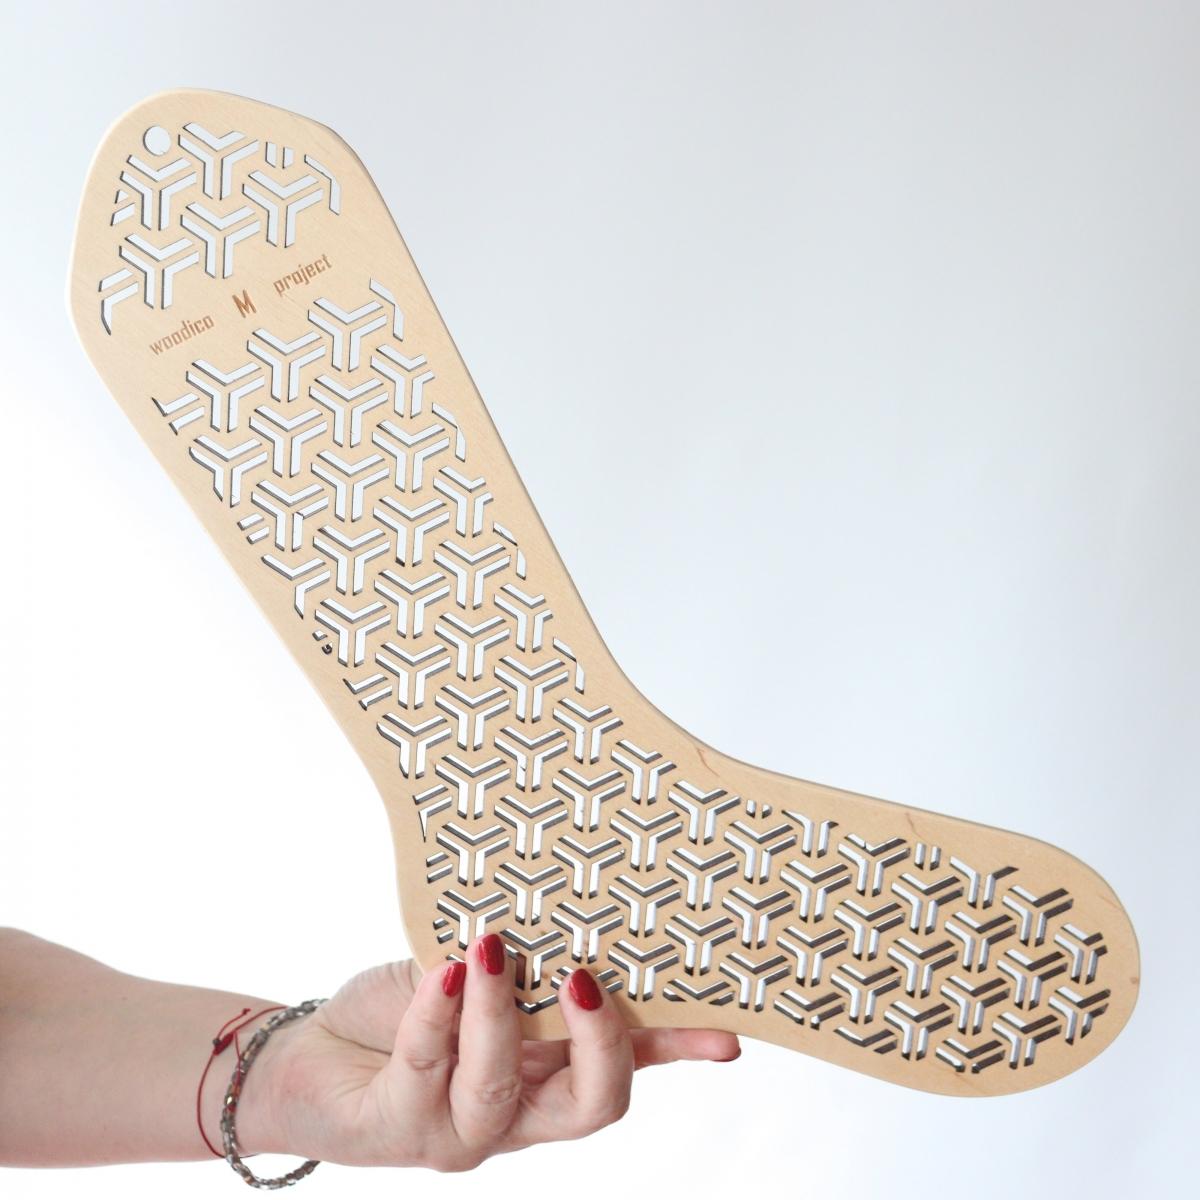 woodico.pro wooden sock blockers canvas 4 1200x1200 - Wooden sock blockers / Canvas